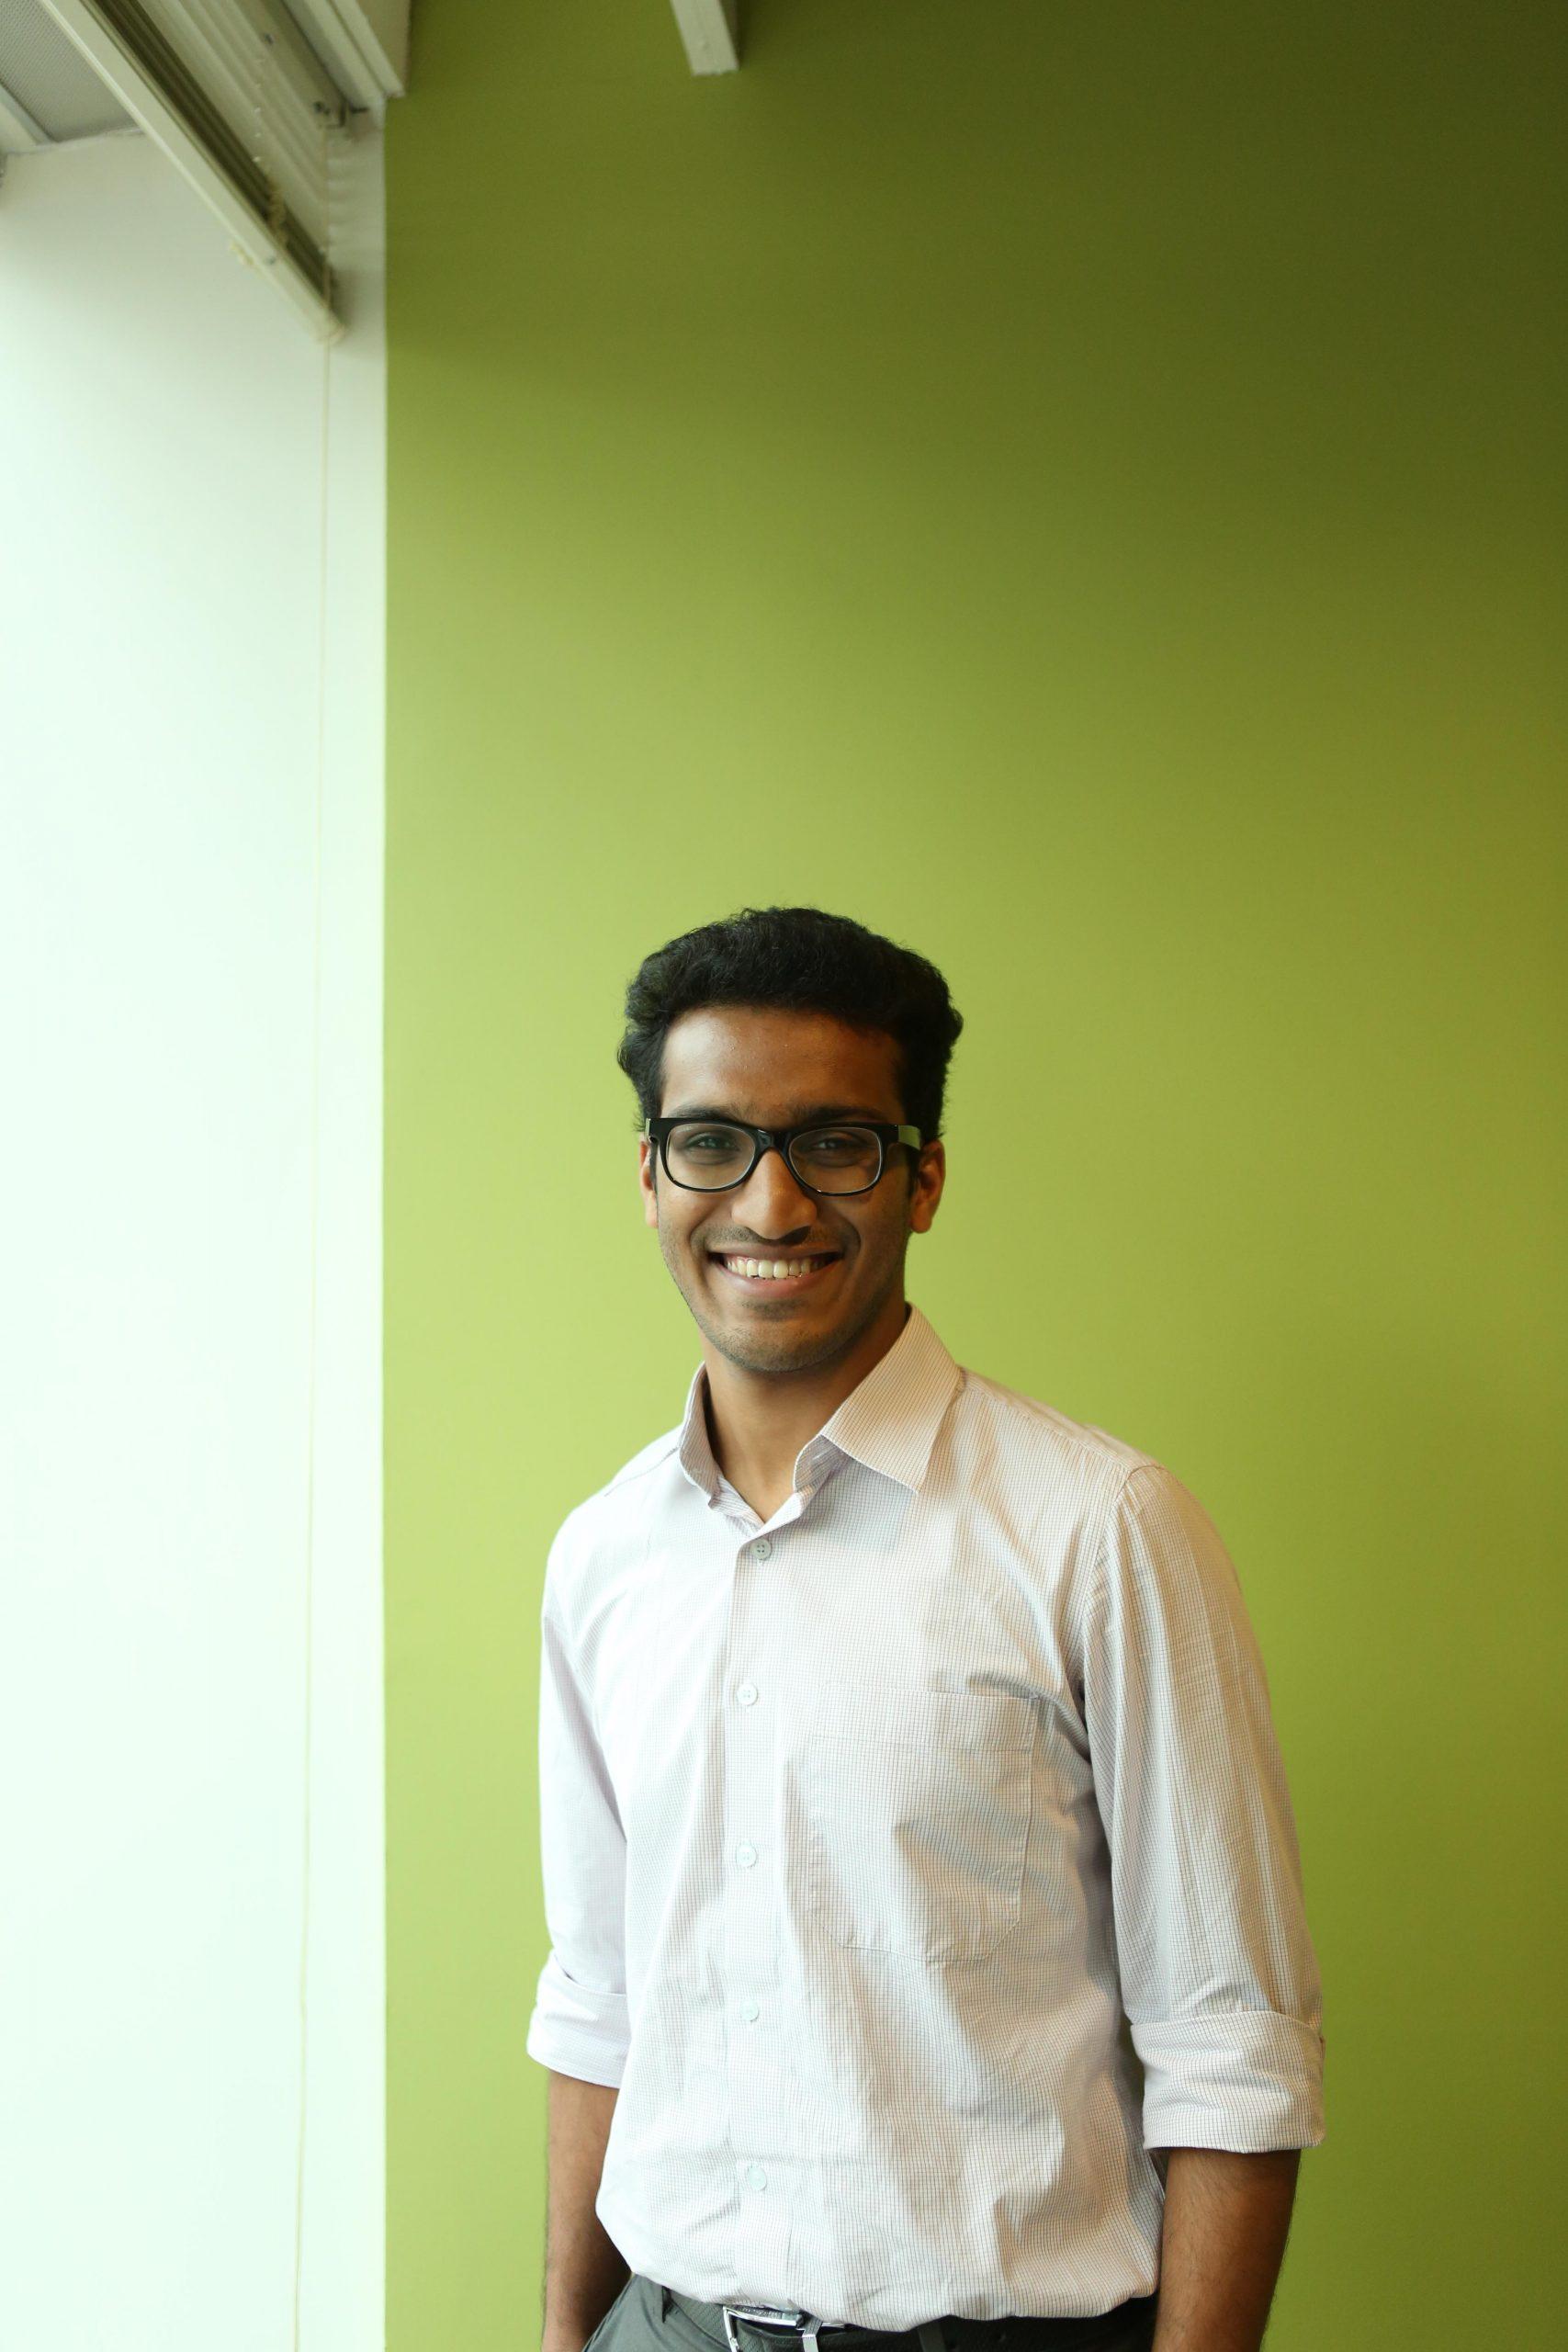 Behani Varun